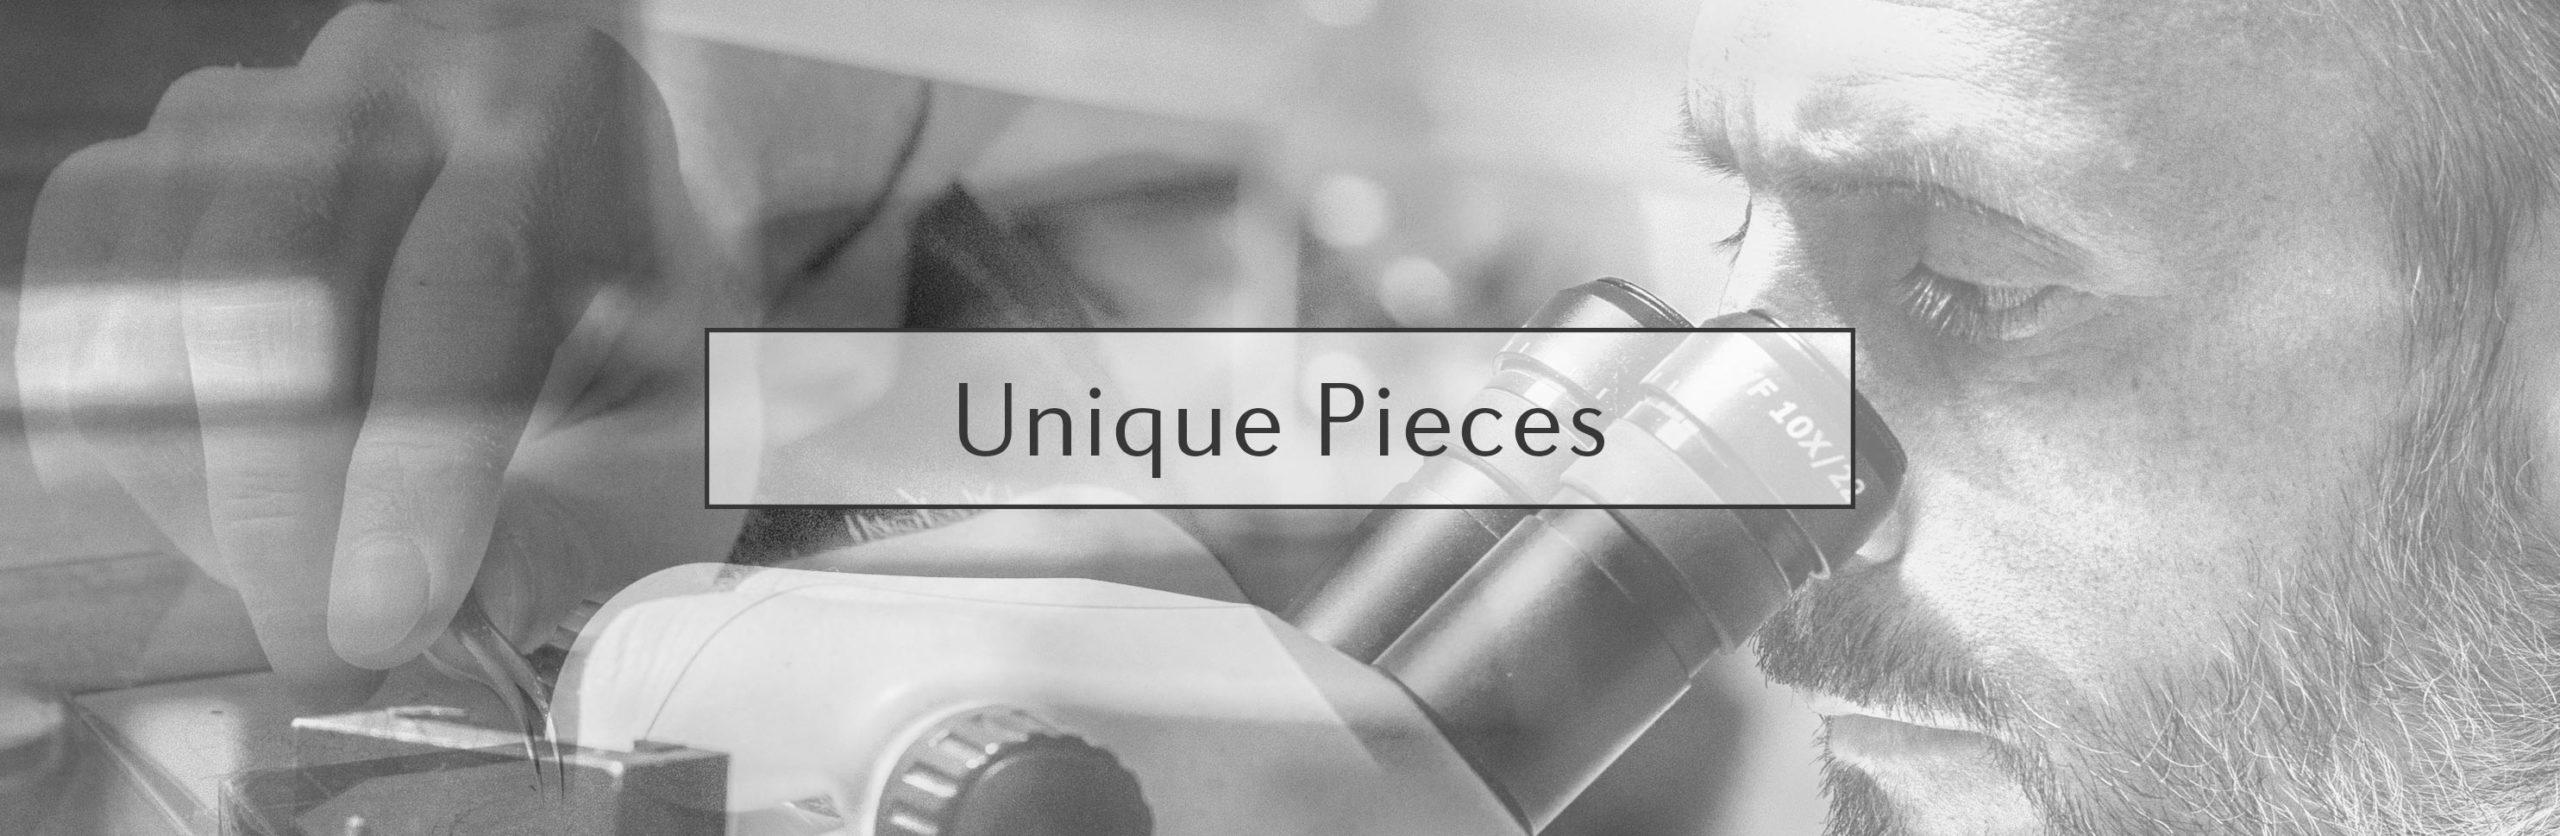 Unique pieces